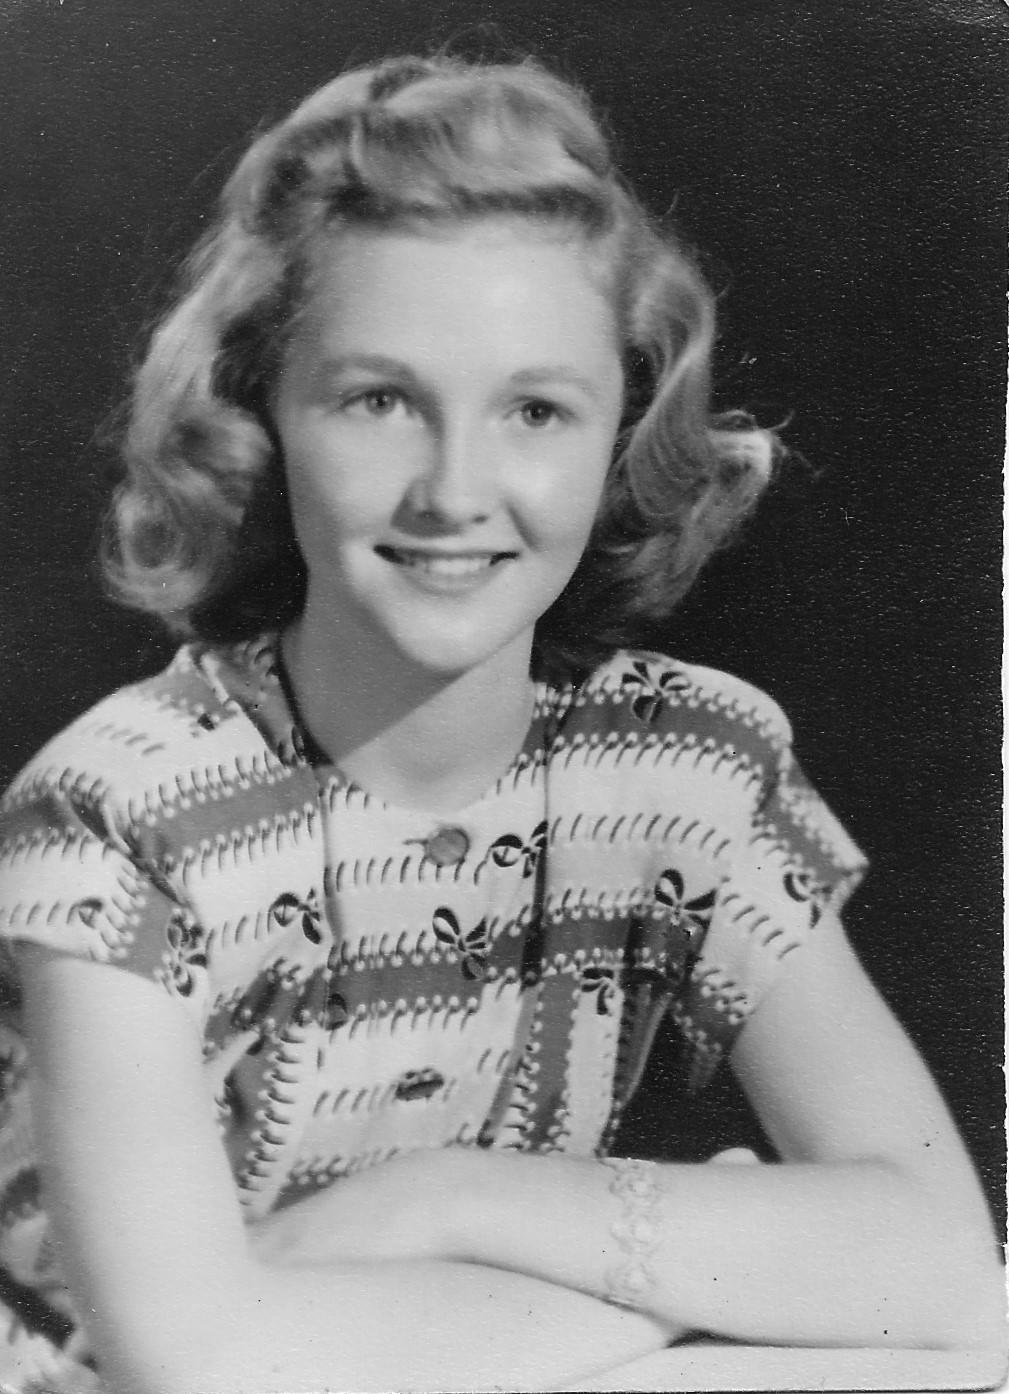 Patricia P. Darby